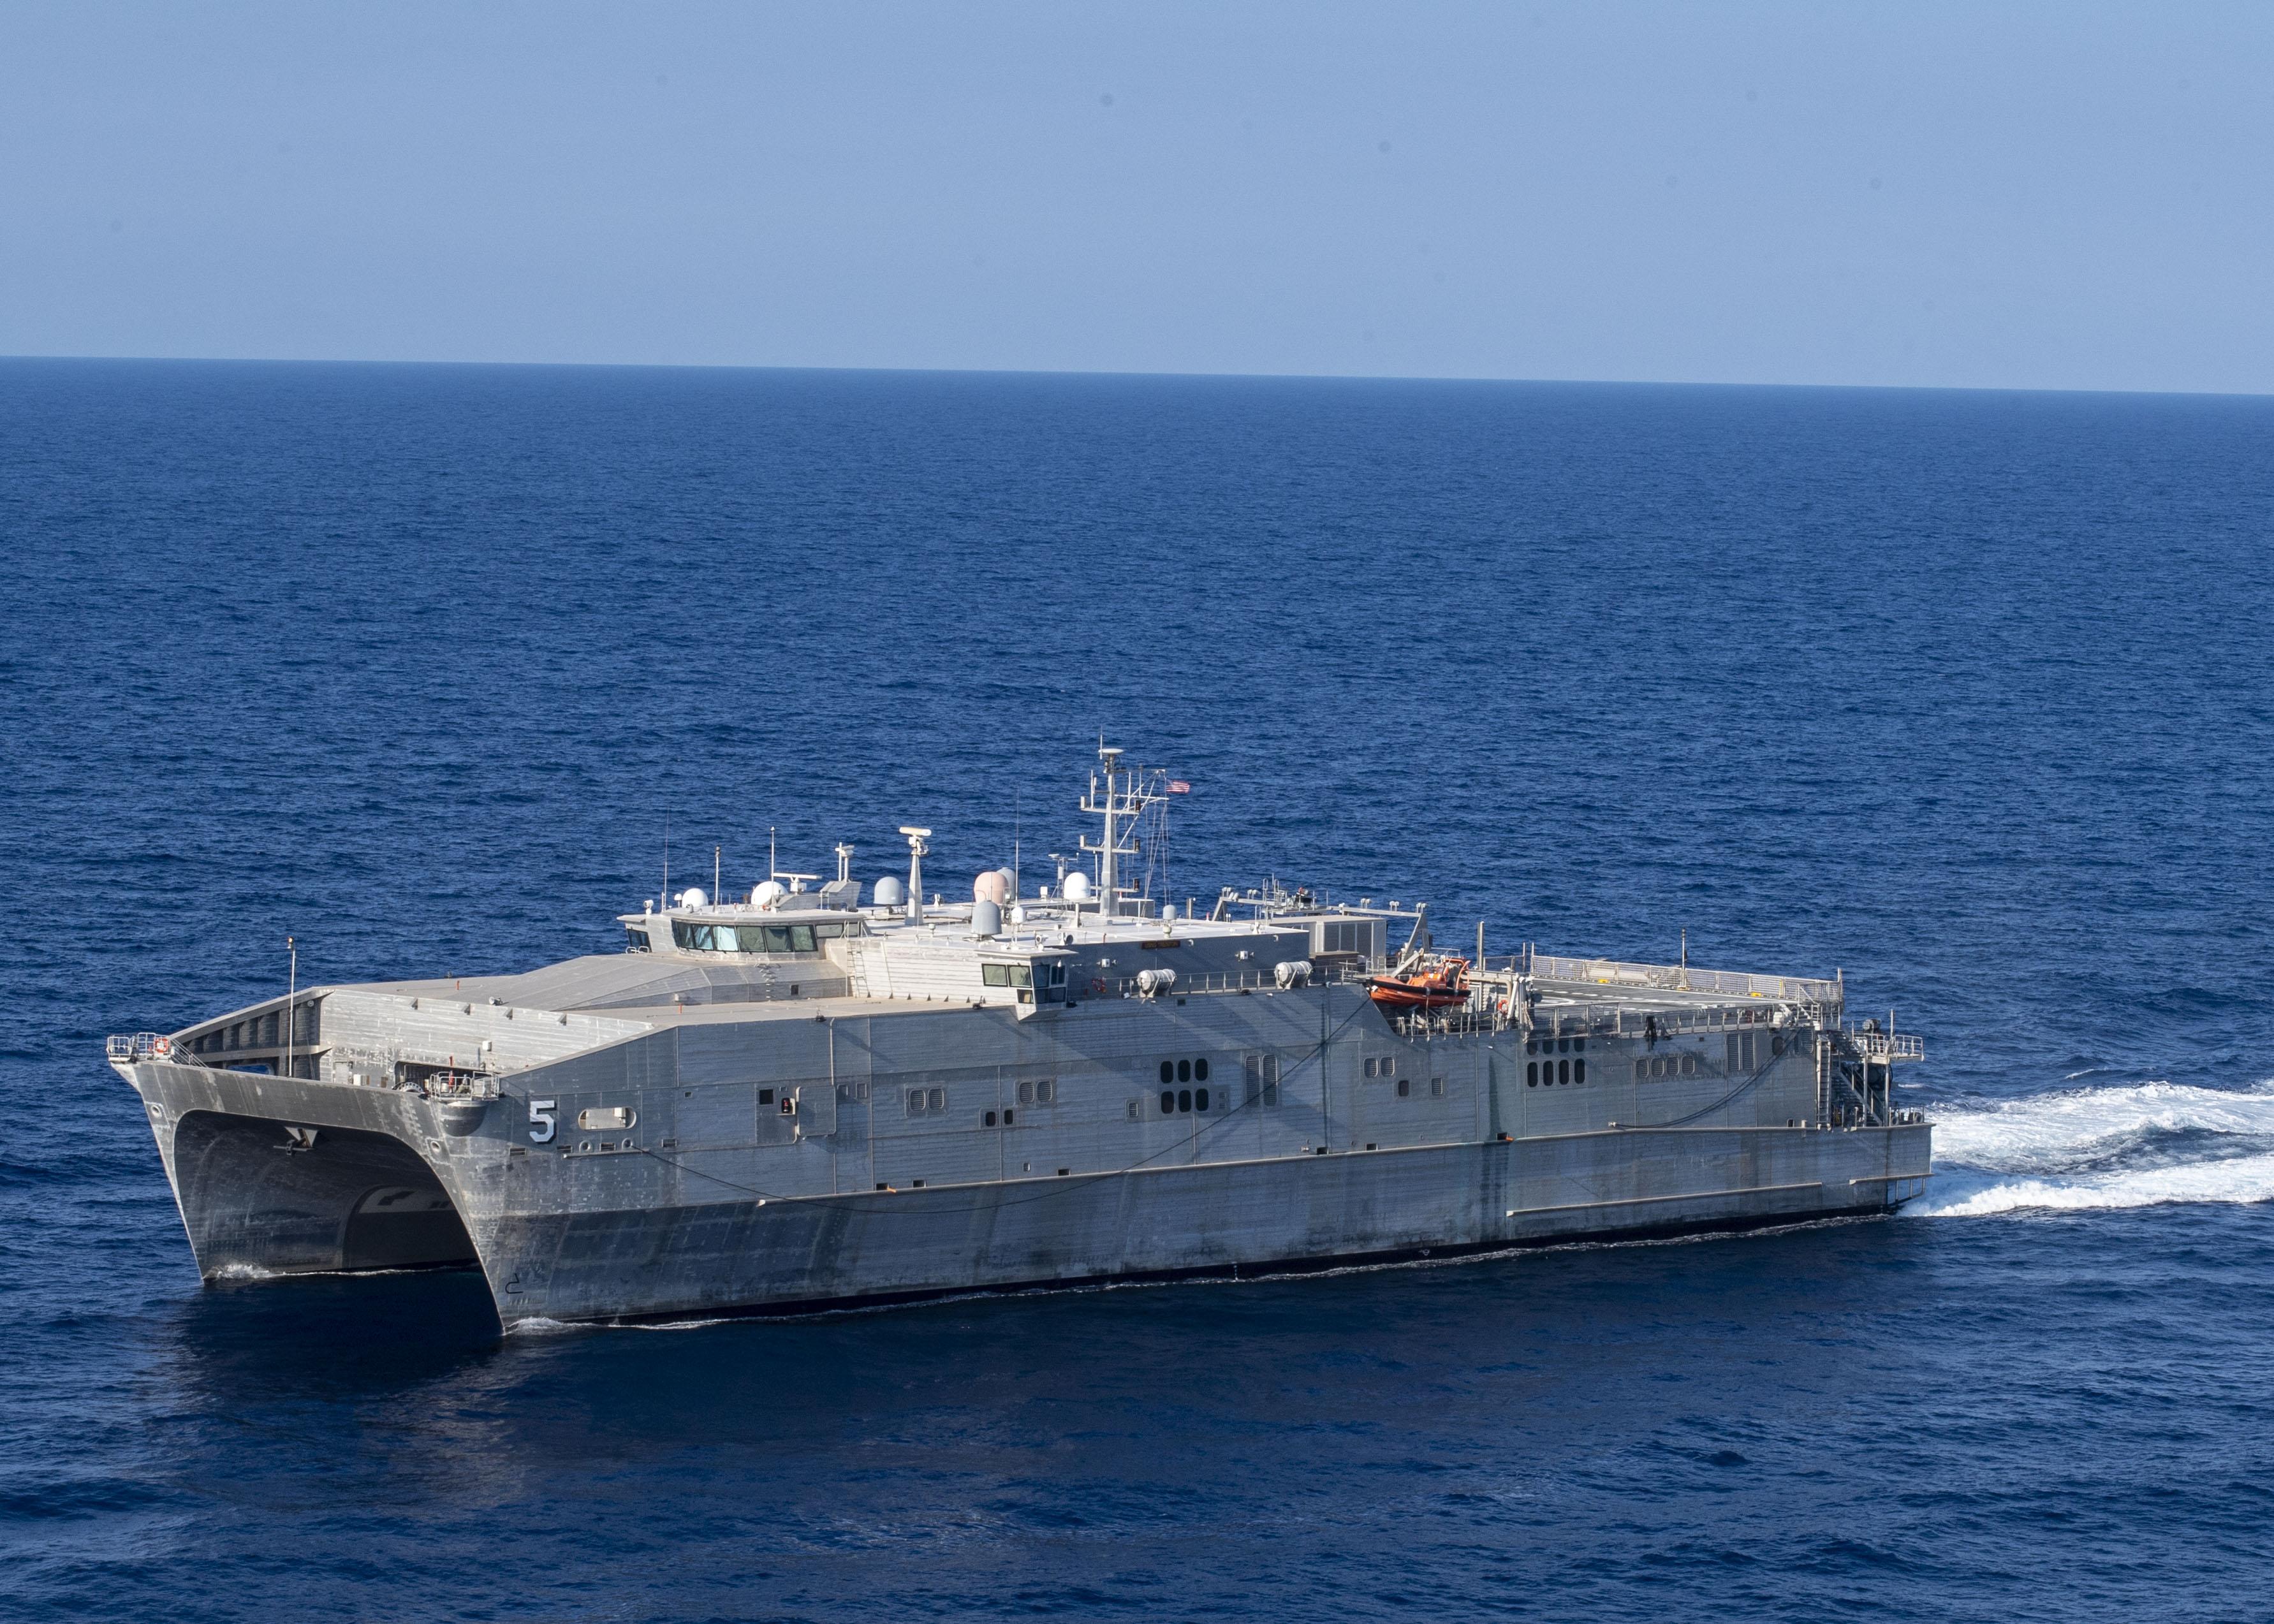 USNS Trenton (T-EPF 5) transits the Mediterranean Sea.